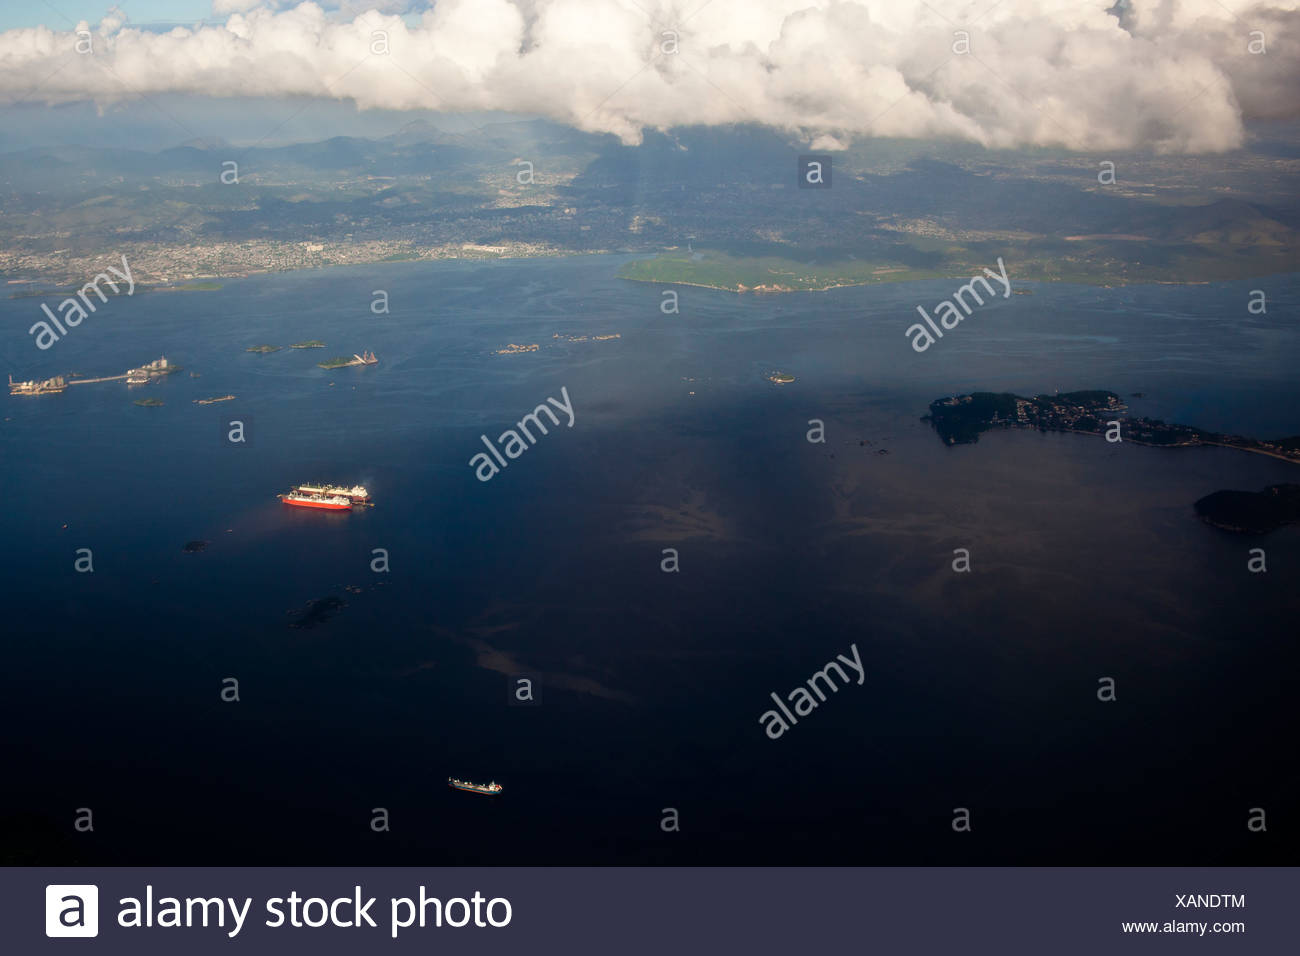 Oil spill near Paqueta island Guanabara Bay Rio de Janeiro Brazil  environmental degradation water pollution - Stock Image